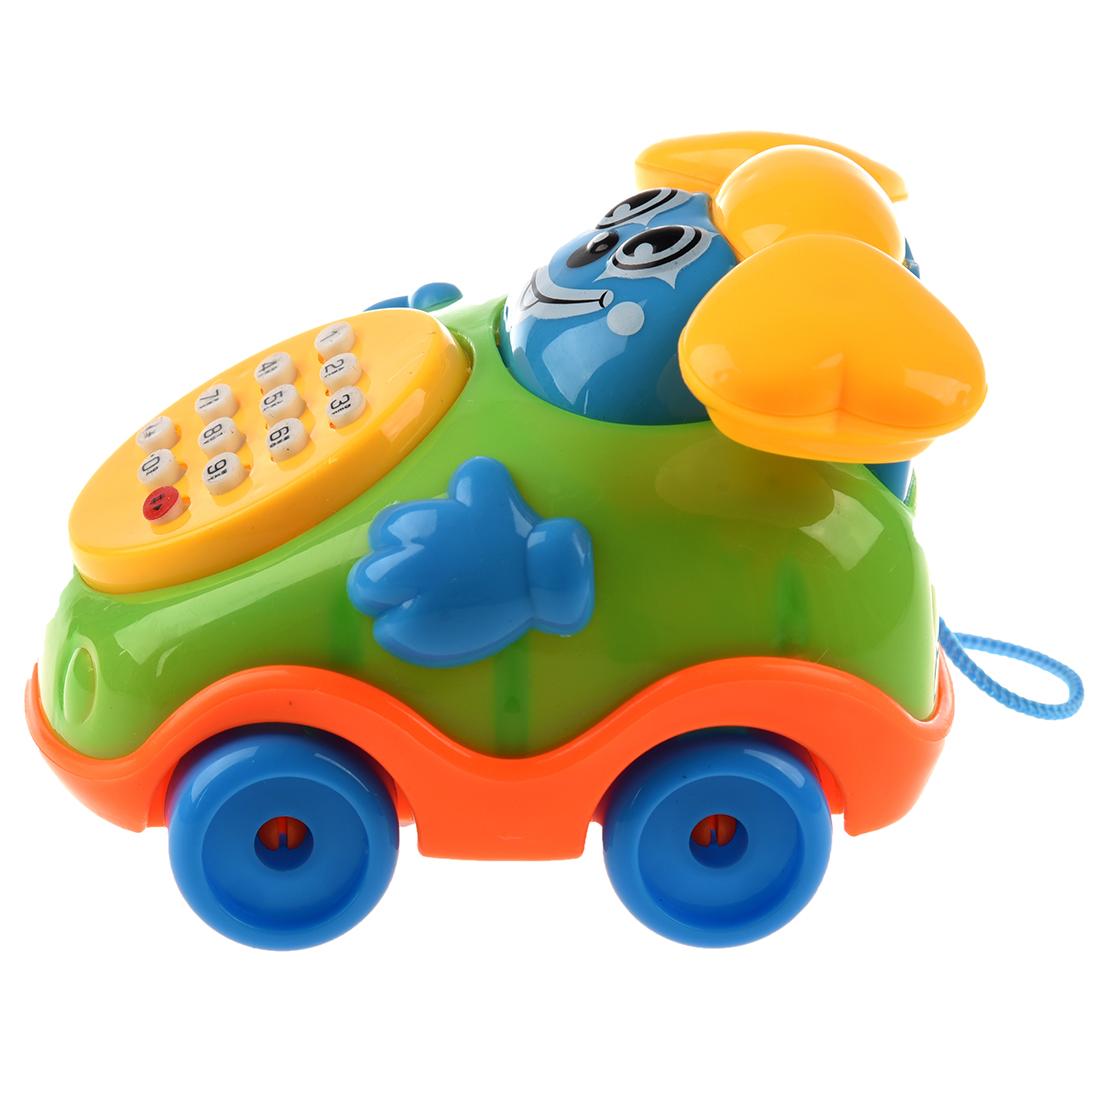 5x Child Puzzle Cartoon Music Phone Toy Car Belt Baby Toys